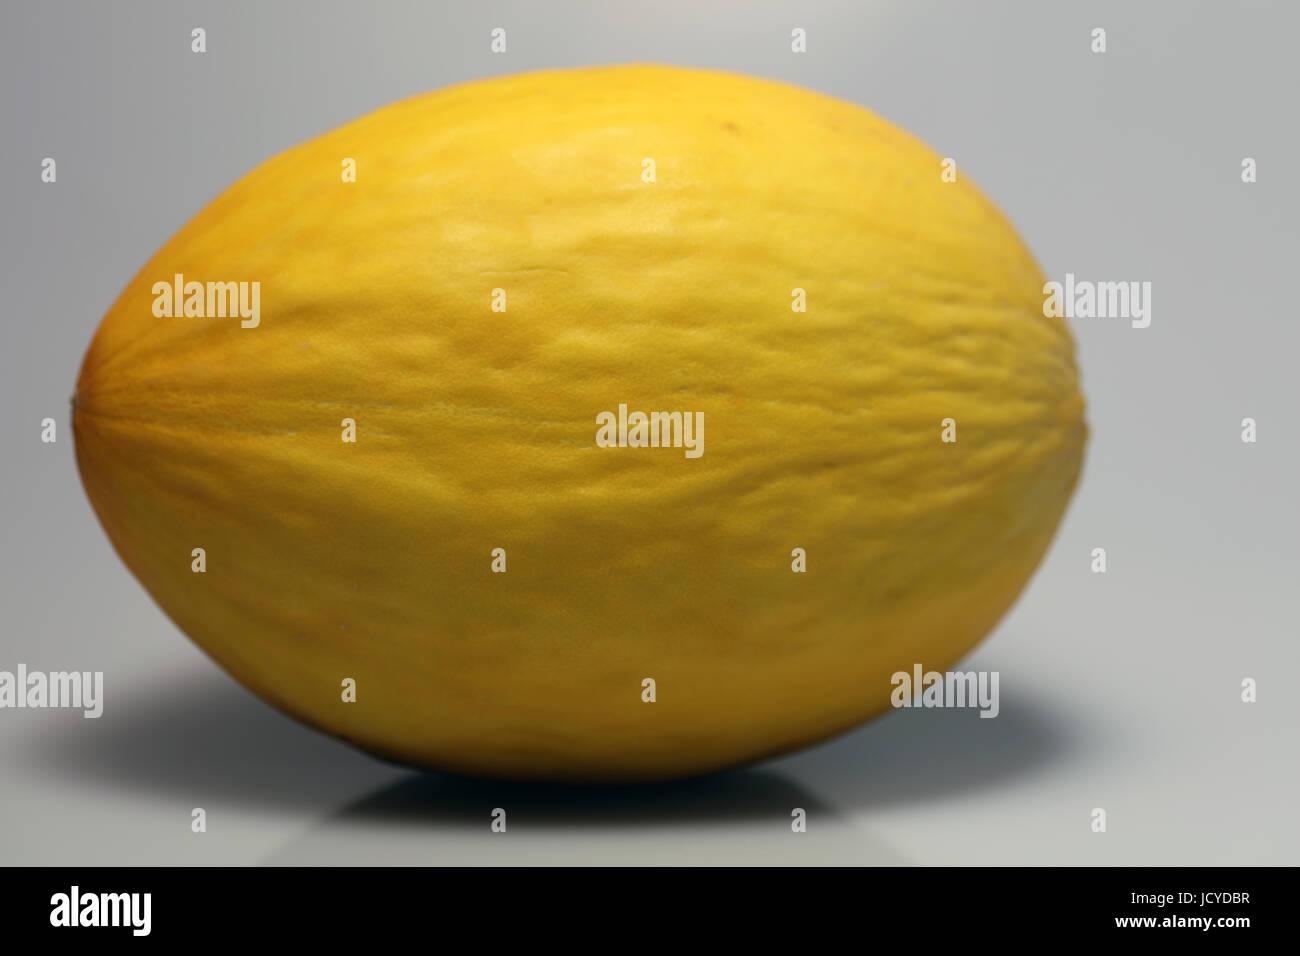 Honigmelone - Stock Image